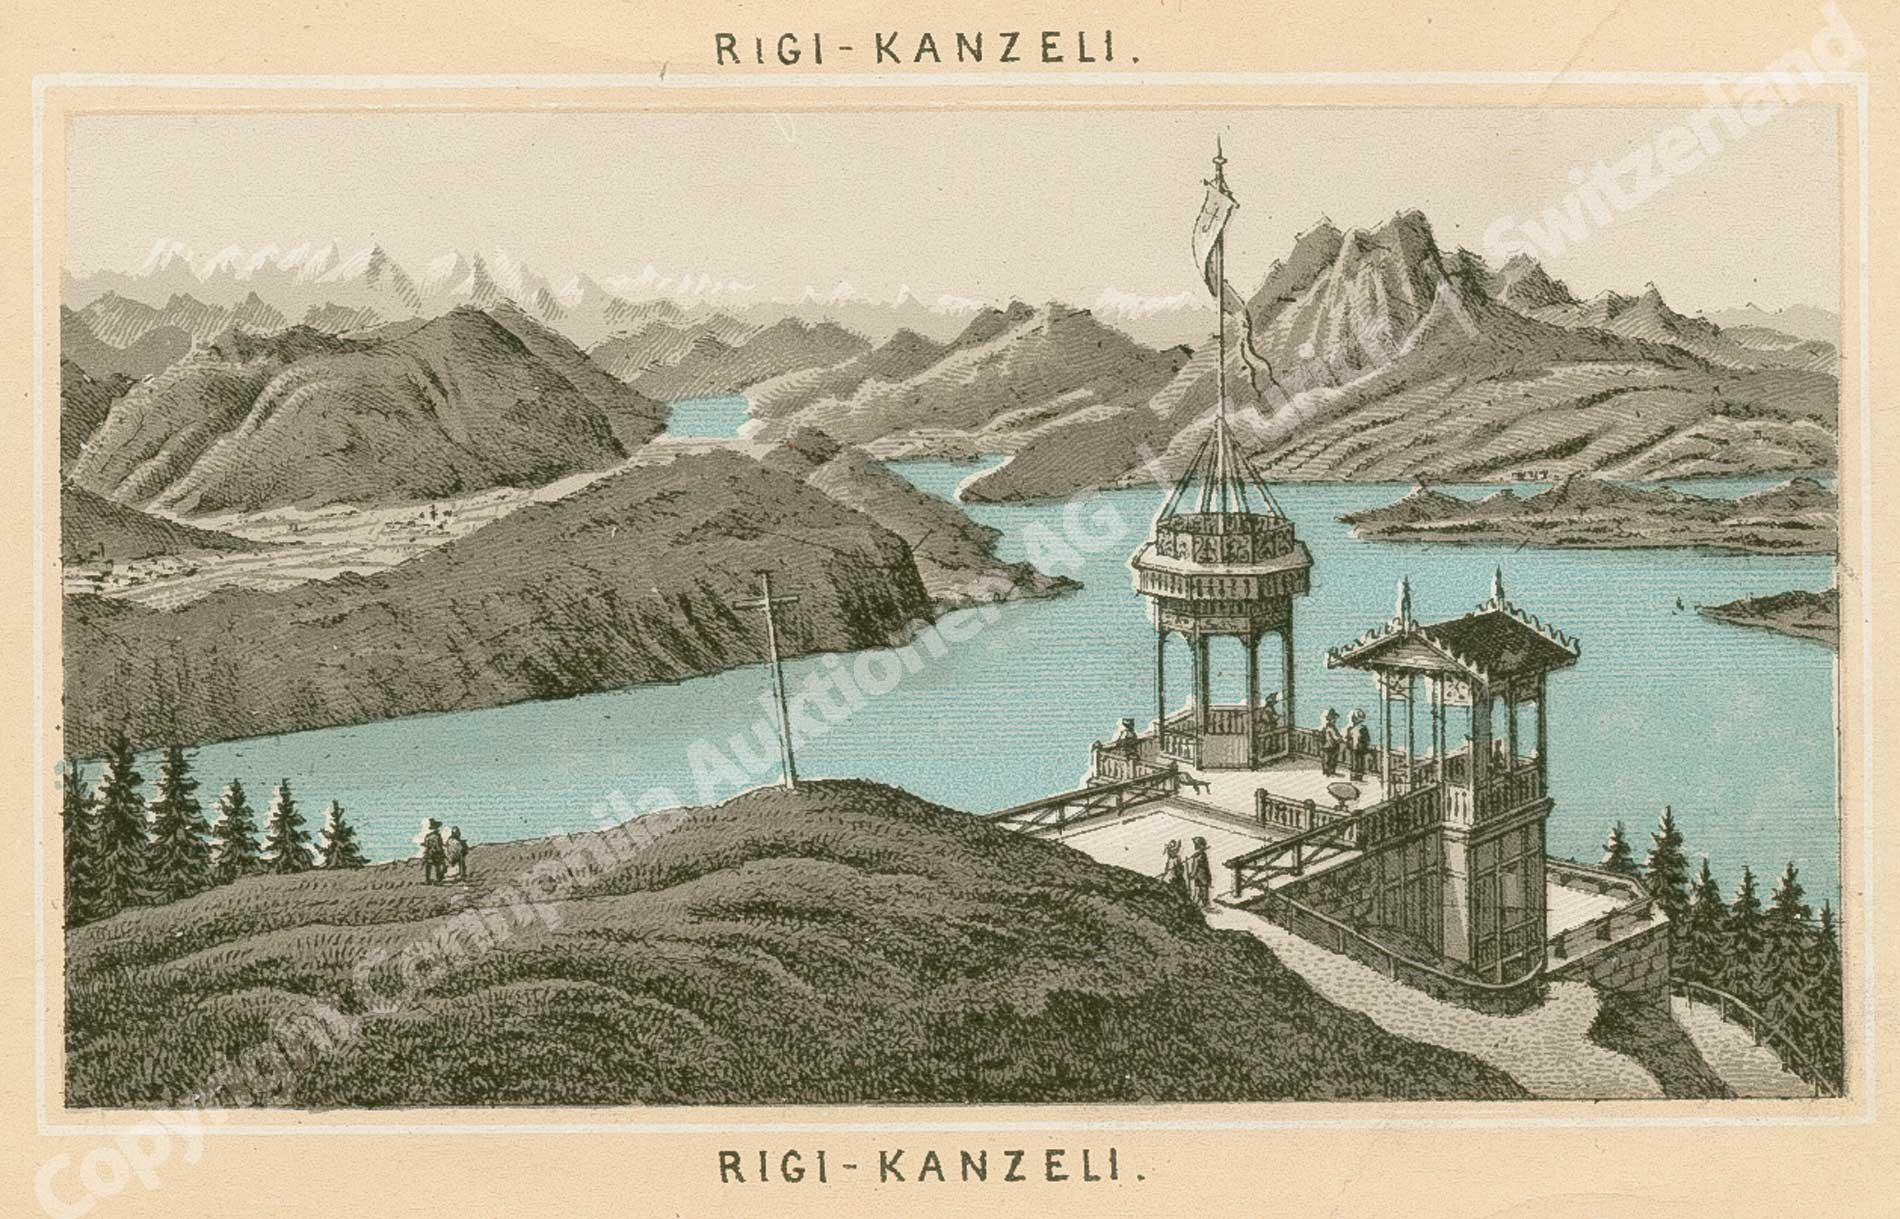 Rigi Kanzlei